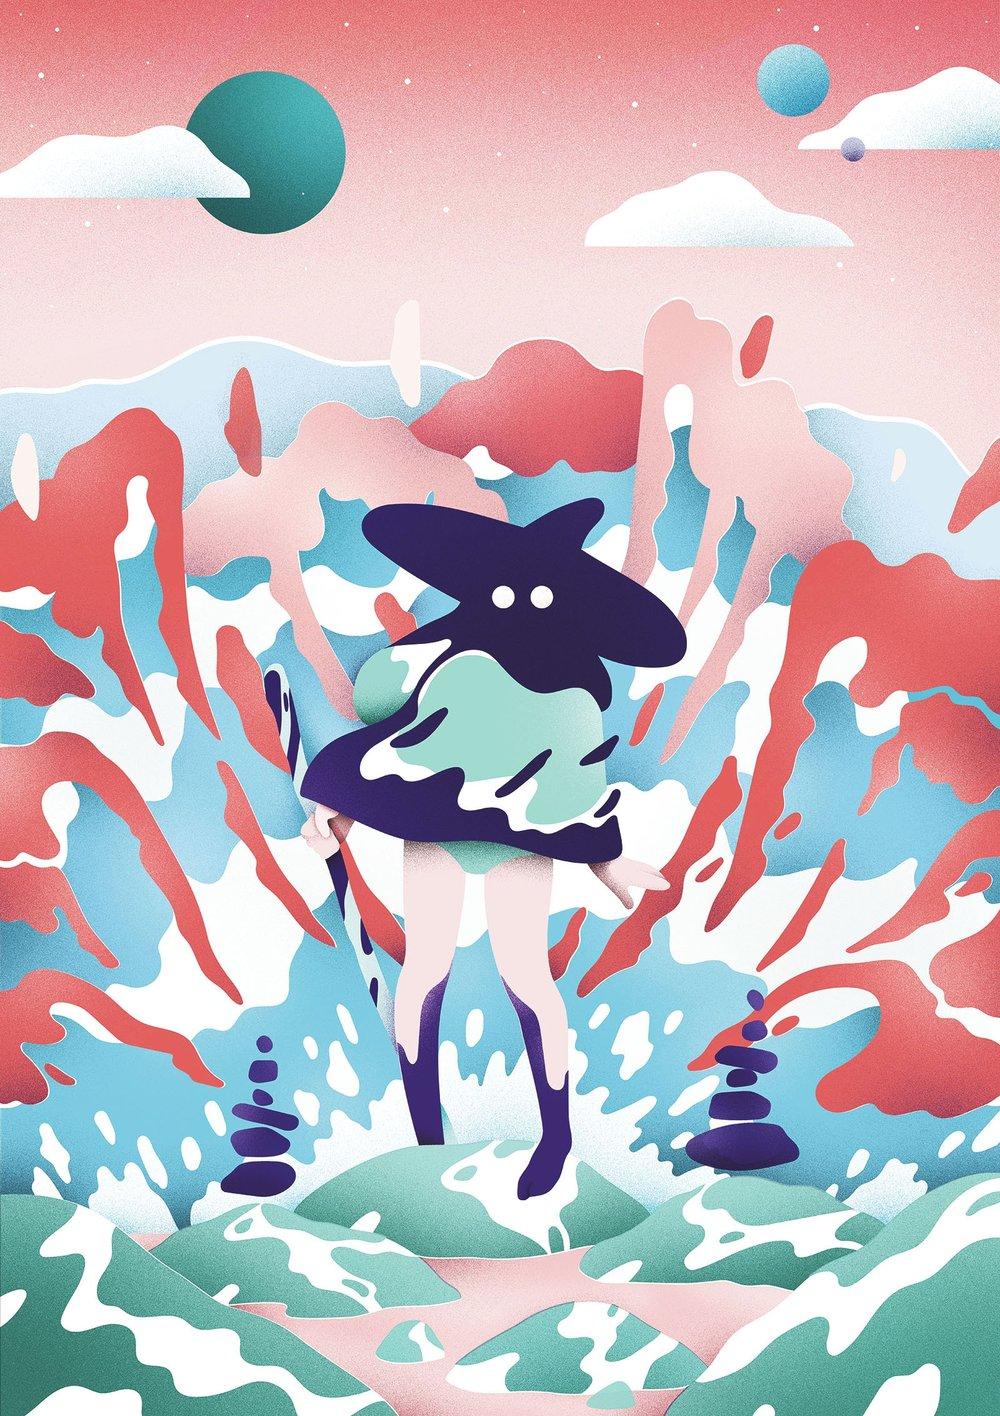 Victoria-Roussel-illustration-art-5.jpg